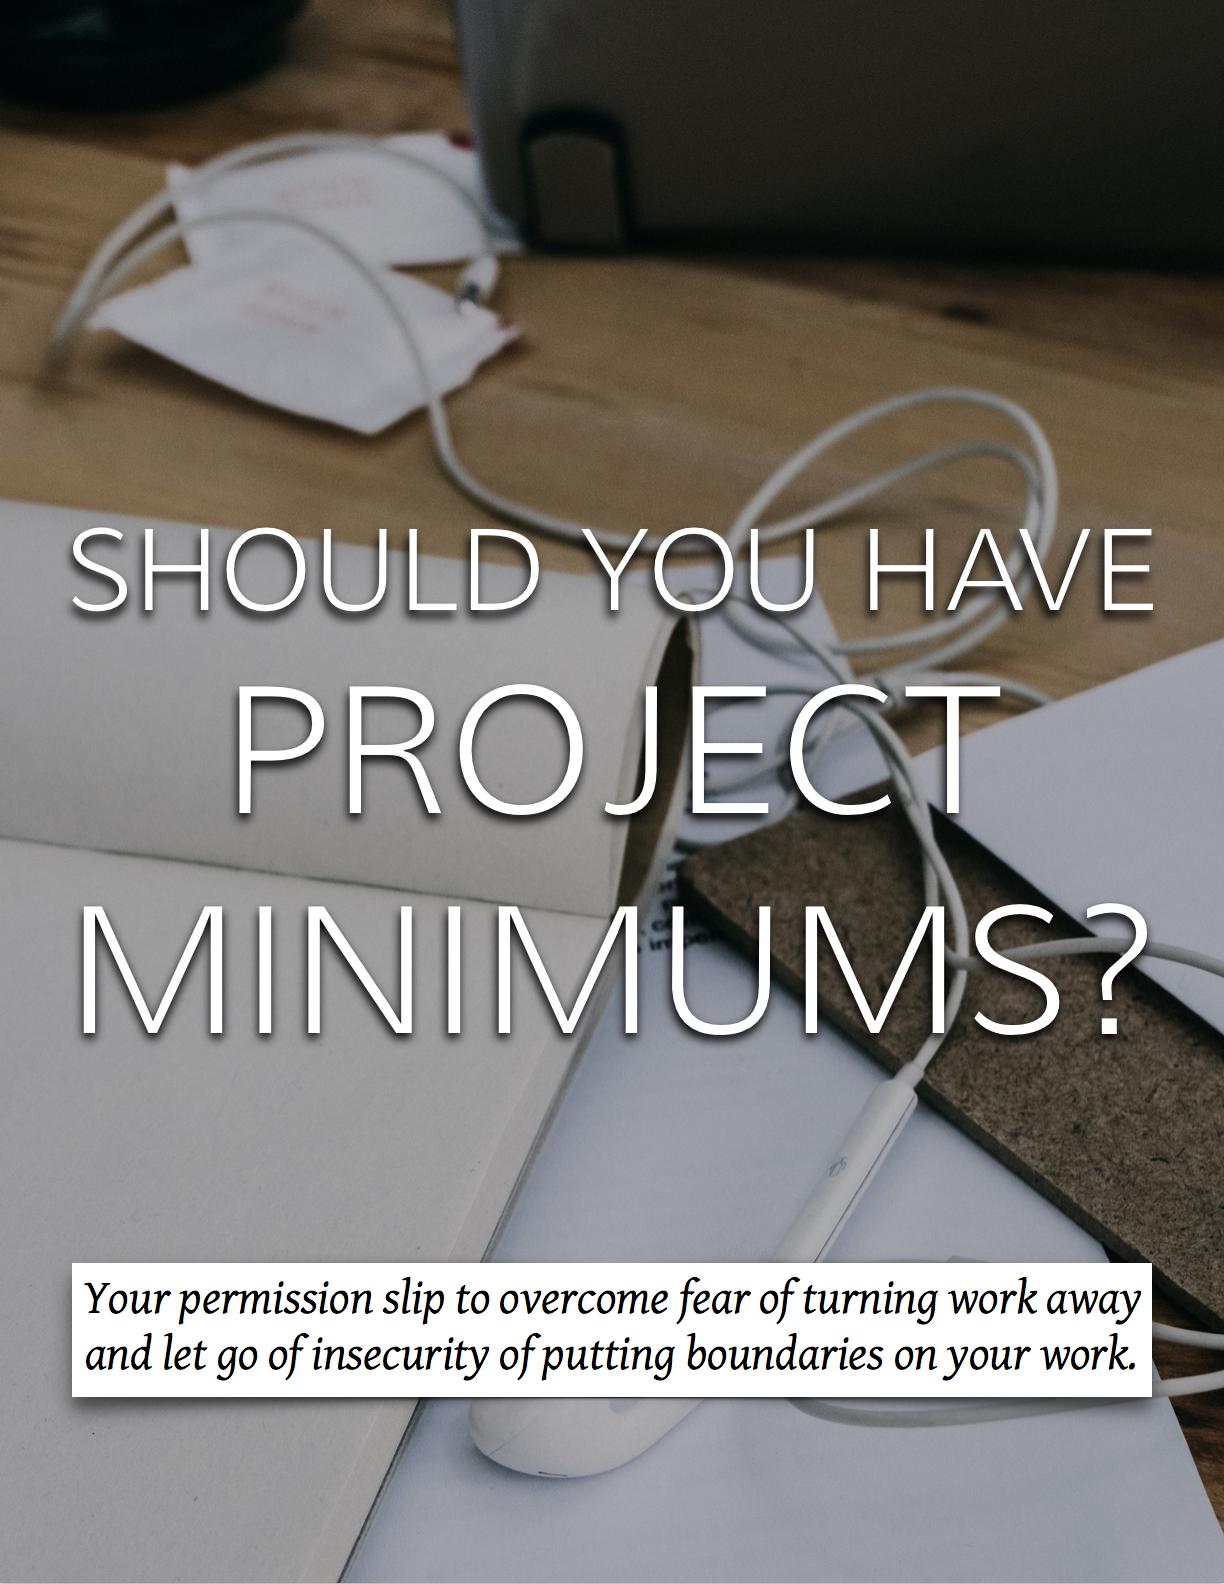 Yes! Implement project minimums! #interiordesignbusiness #cktradesecrets #projectminimums